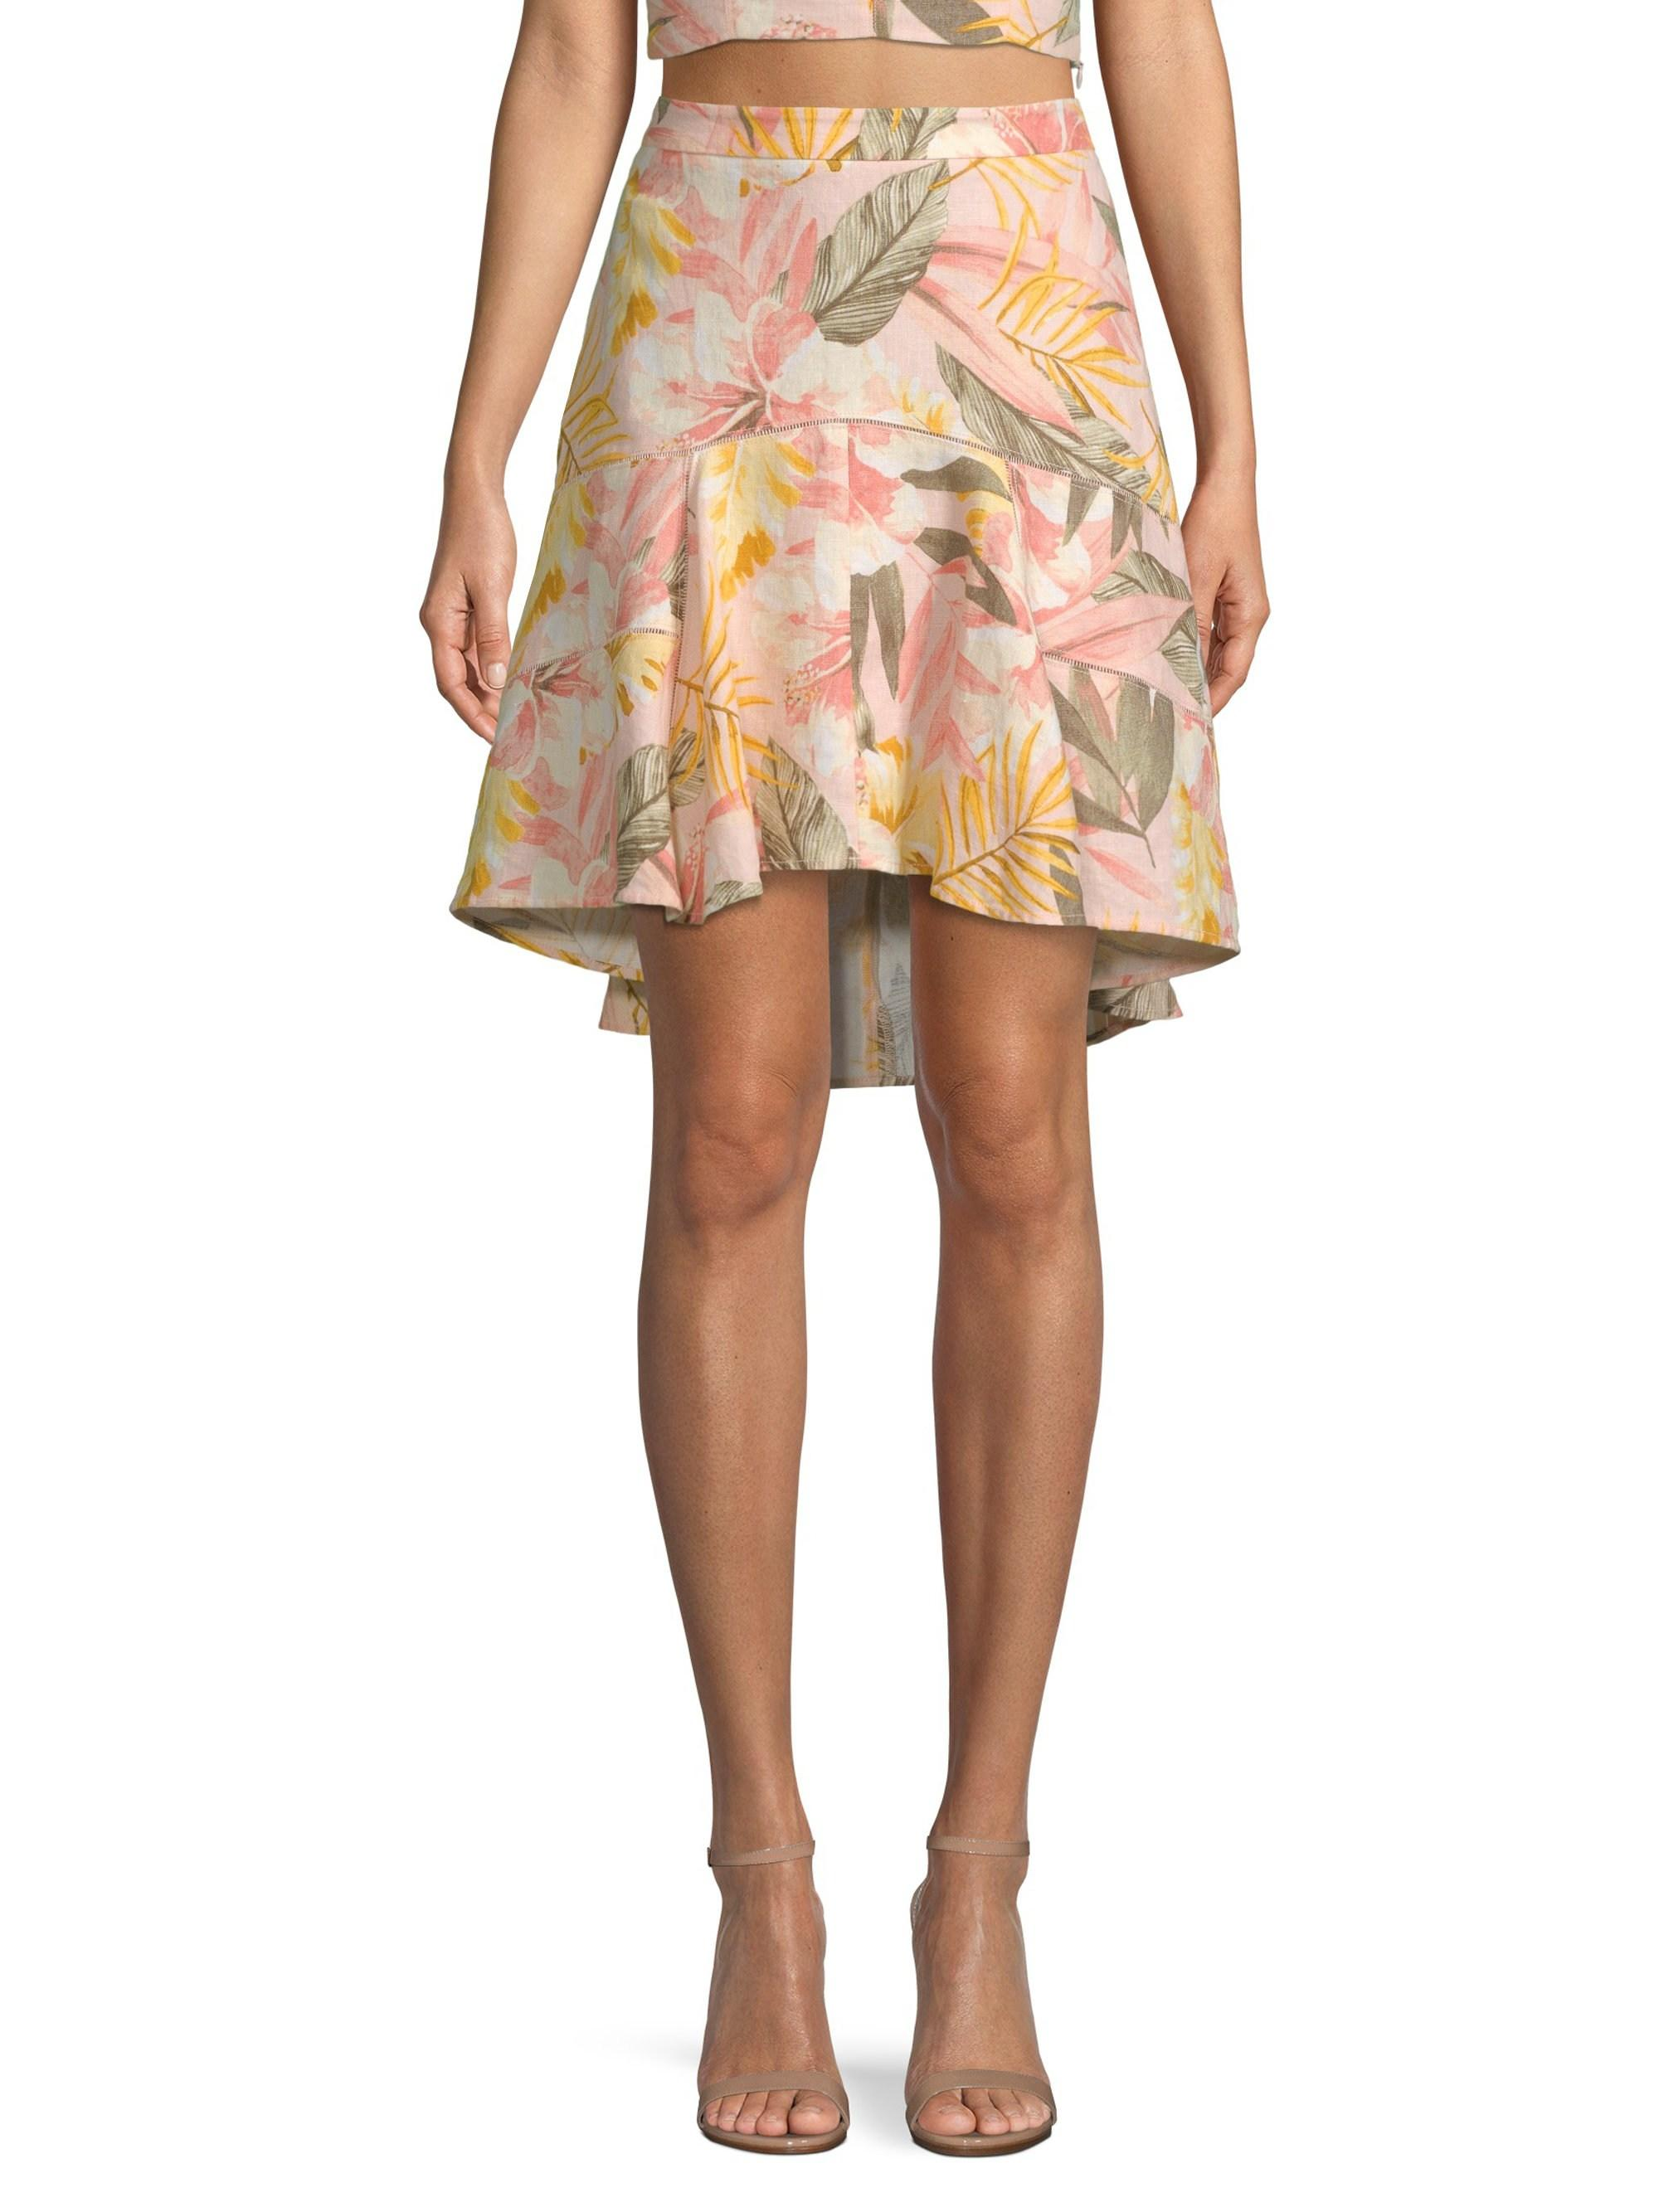 511473bf81 Joie Women's Radhiya Floral Flounce Skirt - Dusty Nude - Size 10 - Lyst